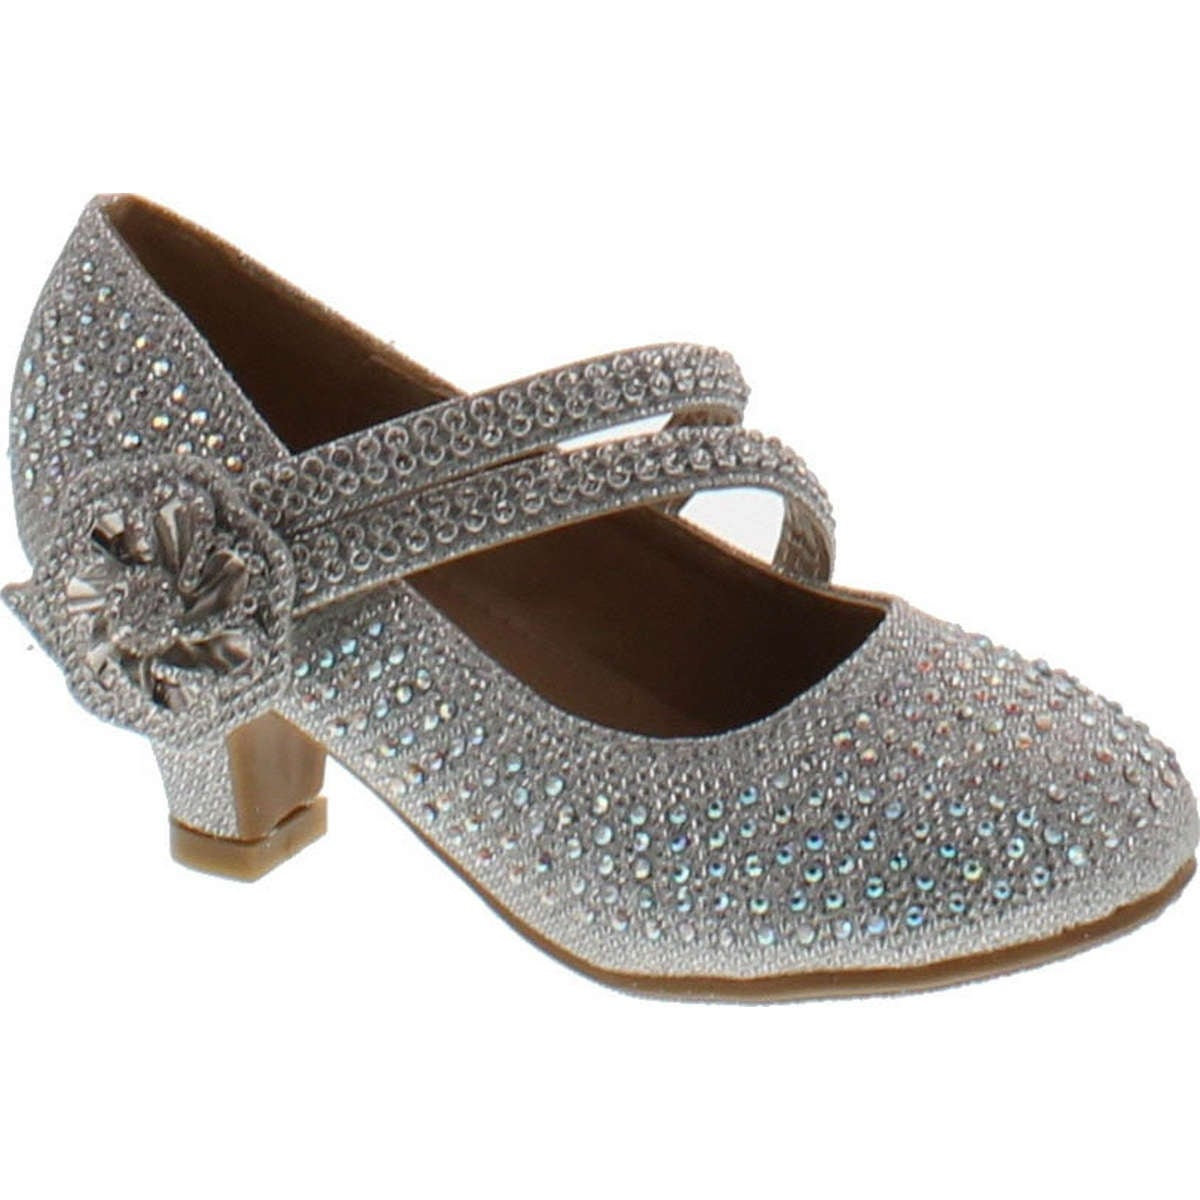 f1c79971876700 Link Justice-06 Children Girl Comfort Rhinestone Ankle Strap Kitten Heel  Pumps